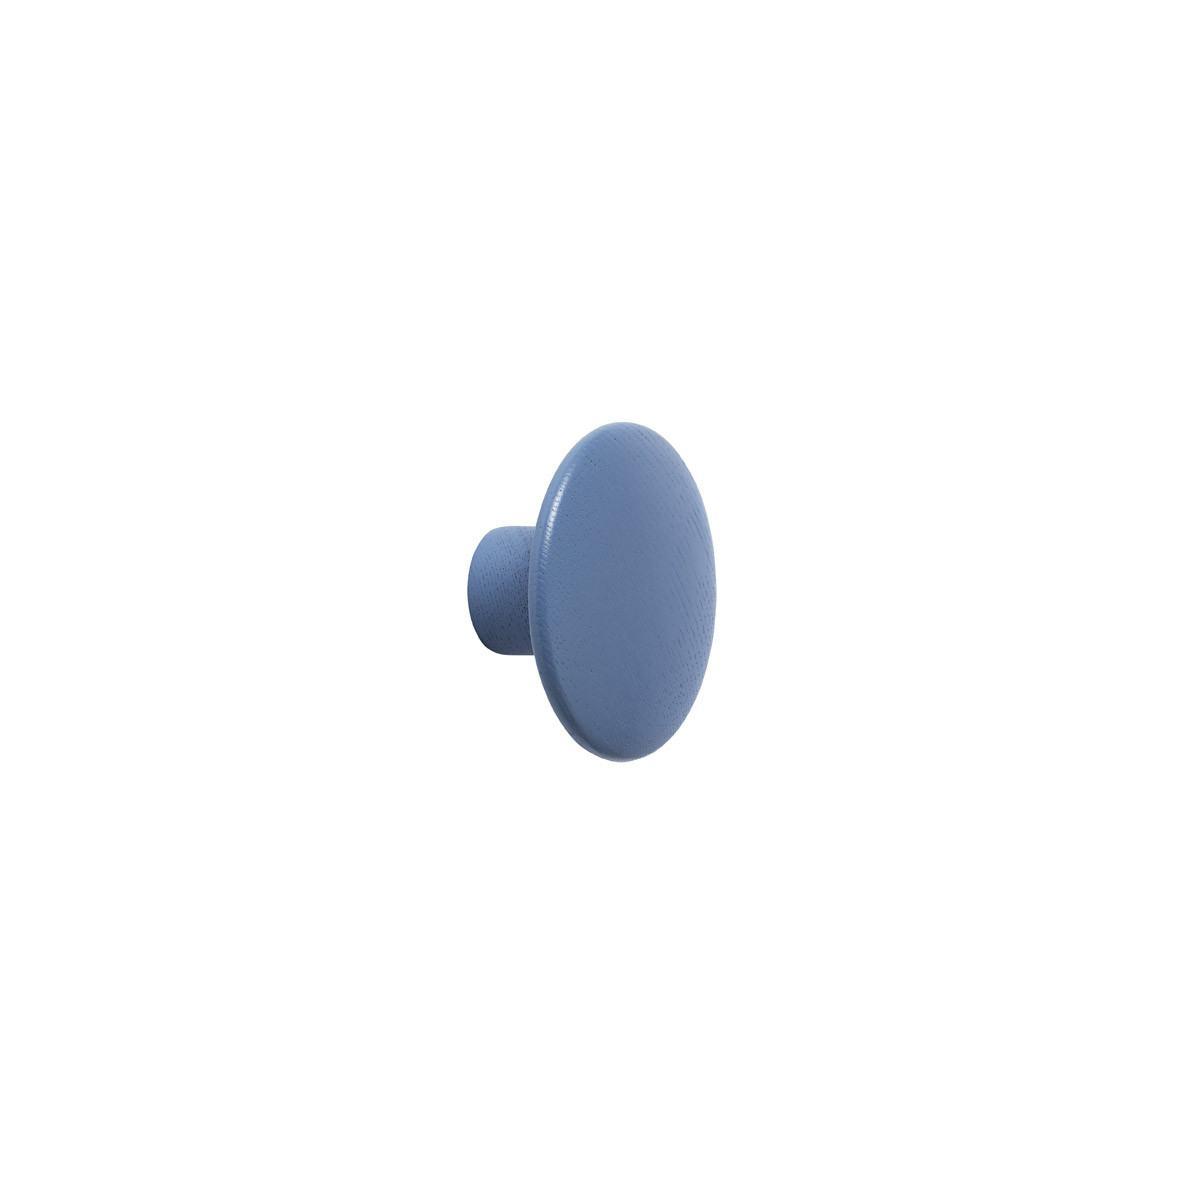 Muuto The Dots 9cm - Small